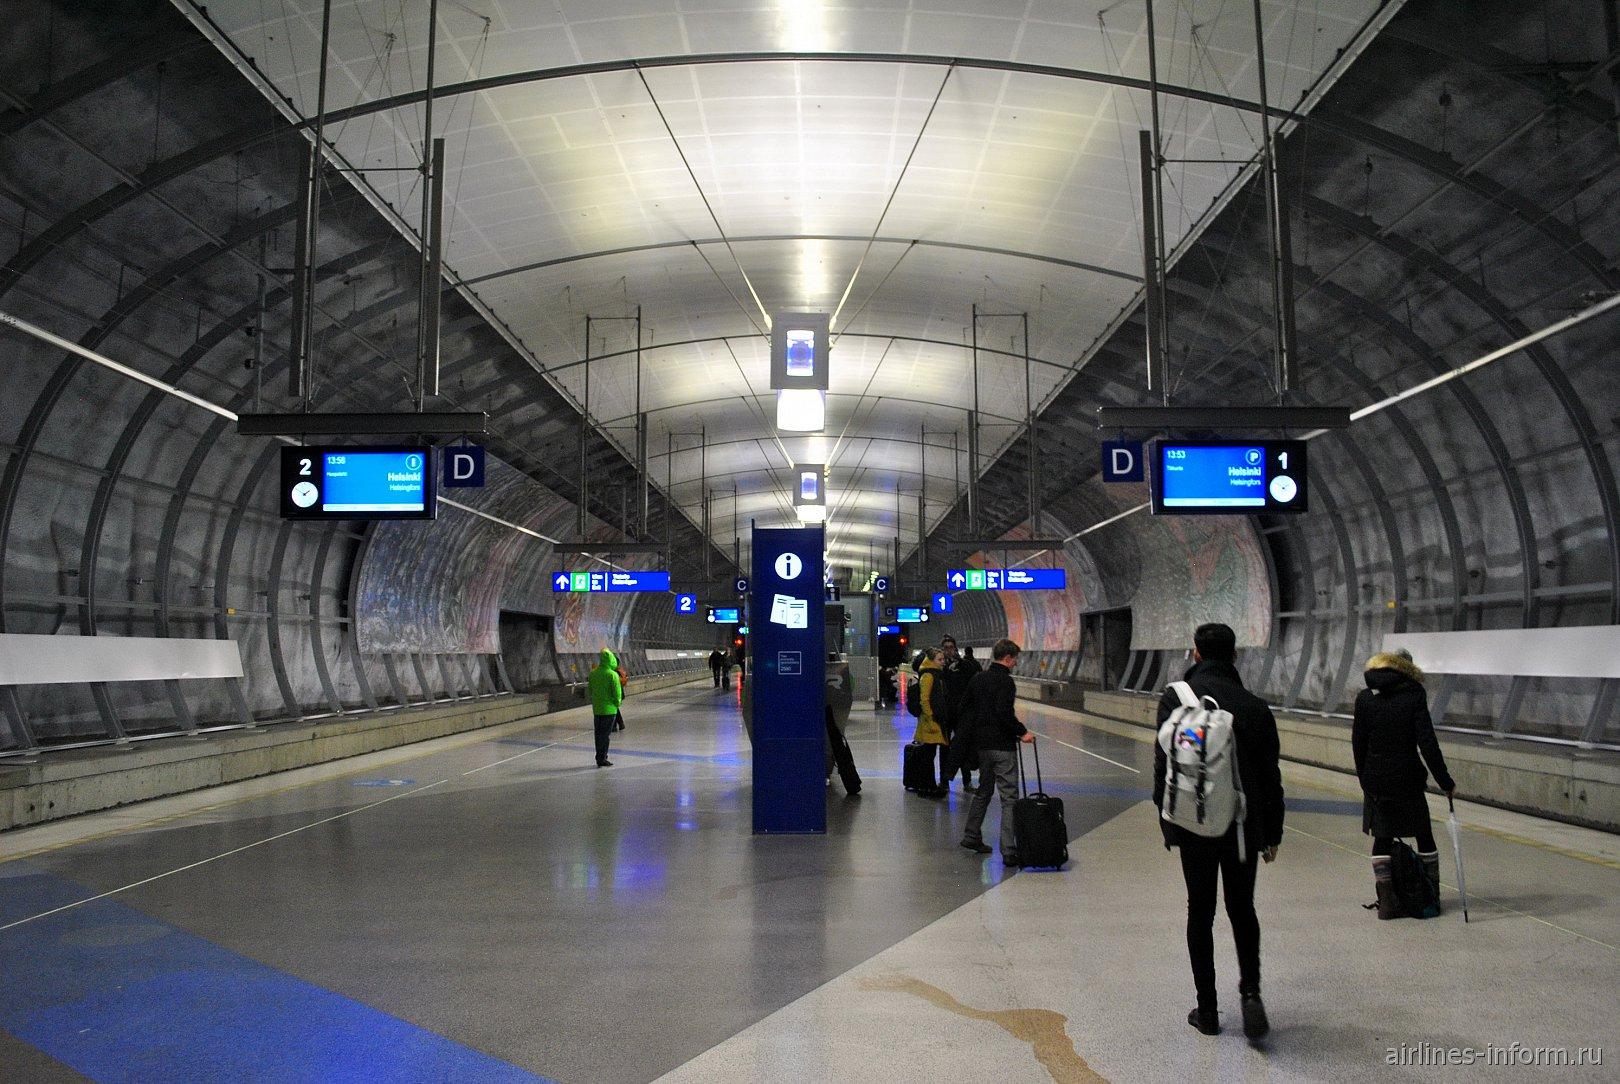 Станция Аэроэкспресса в аэропорту Хельсинки Вантаа